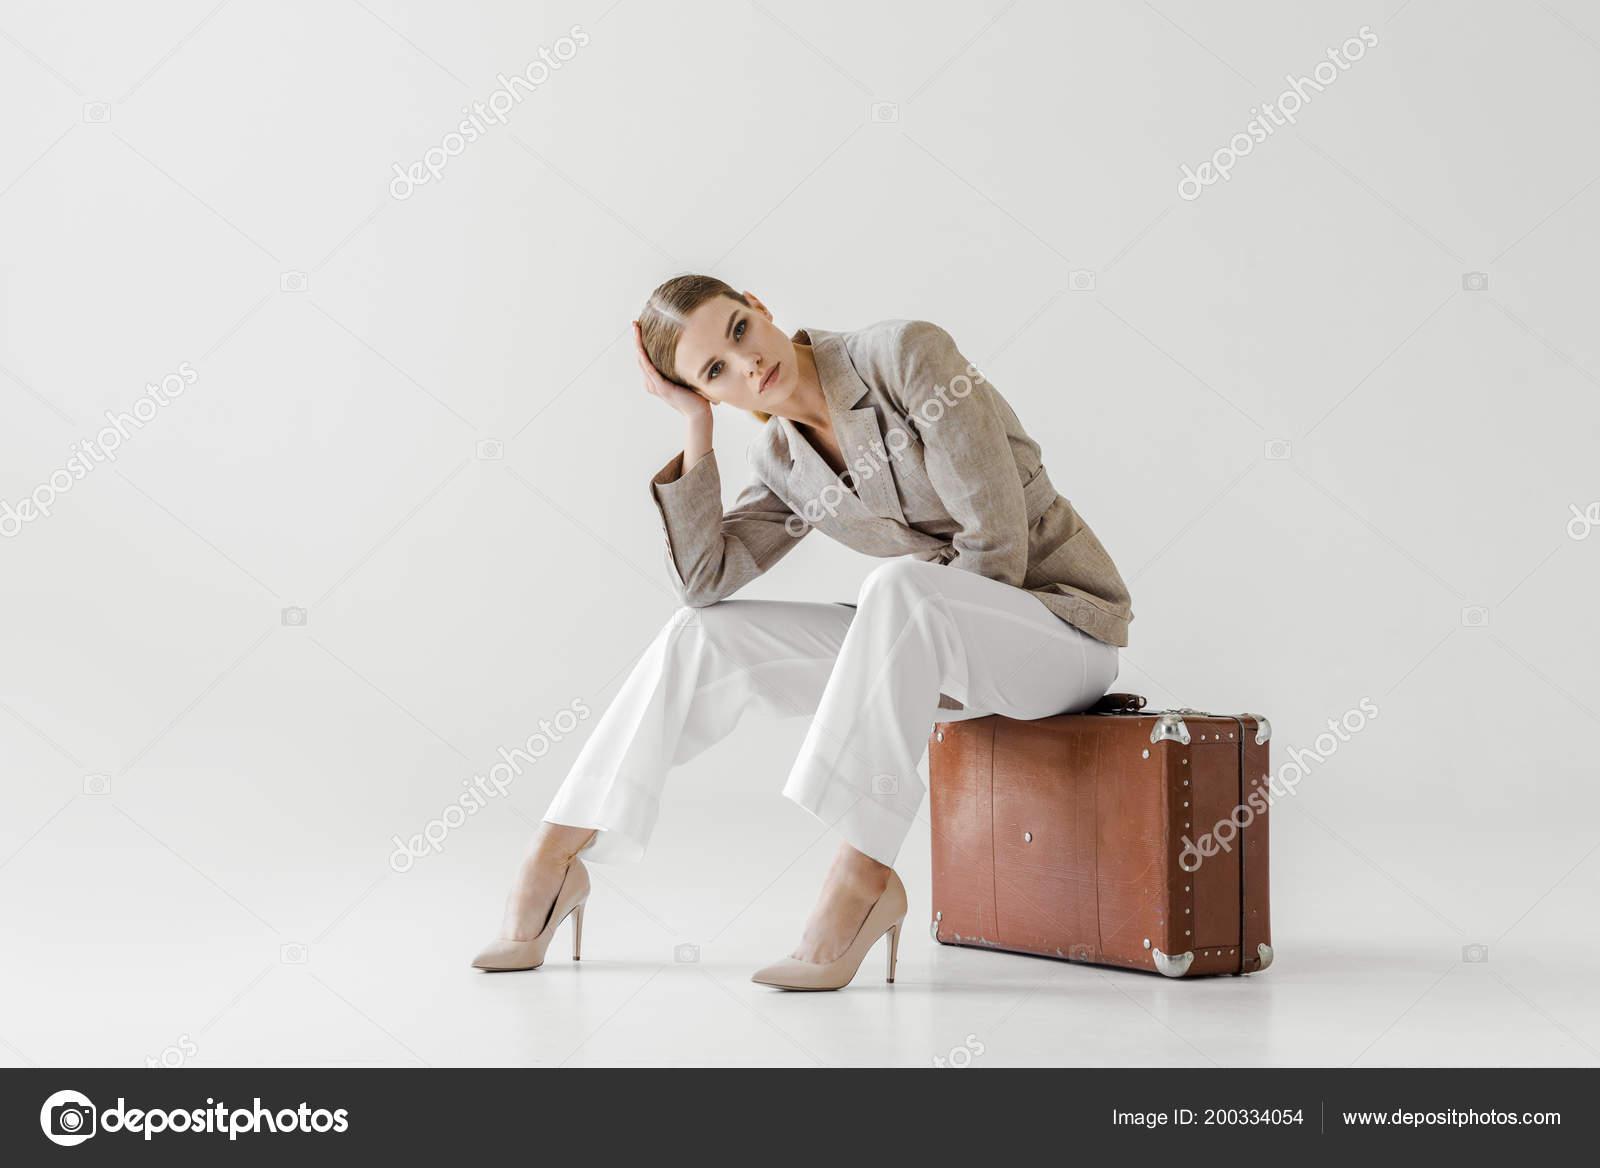 Giovane Modello Femminile Elegante Giacca Lino Seduto Sulla